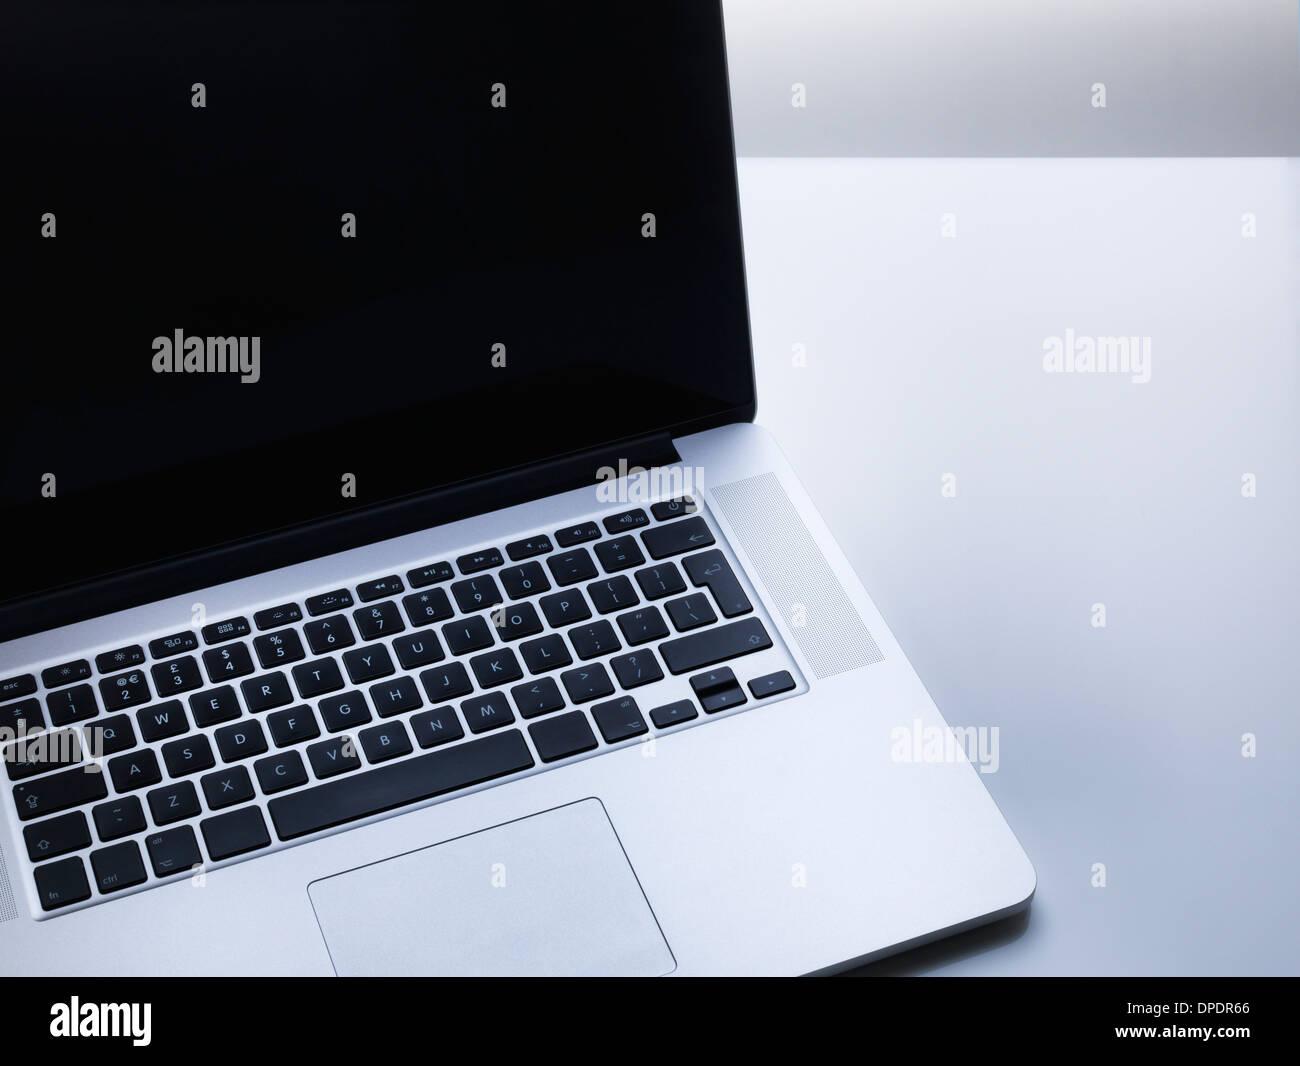 Laptop Computer on desk - Stock Image